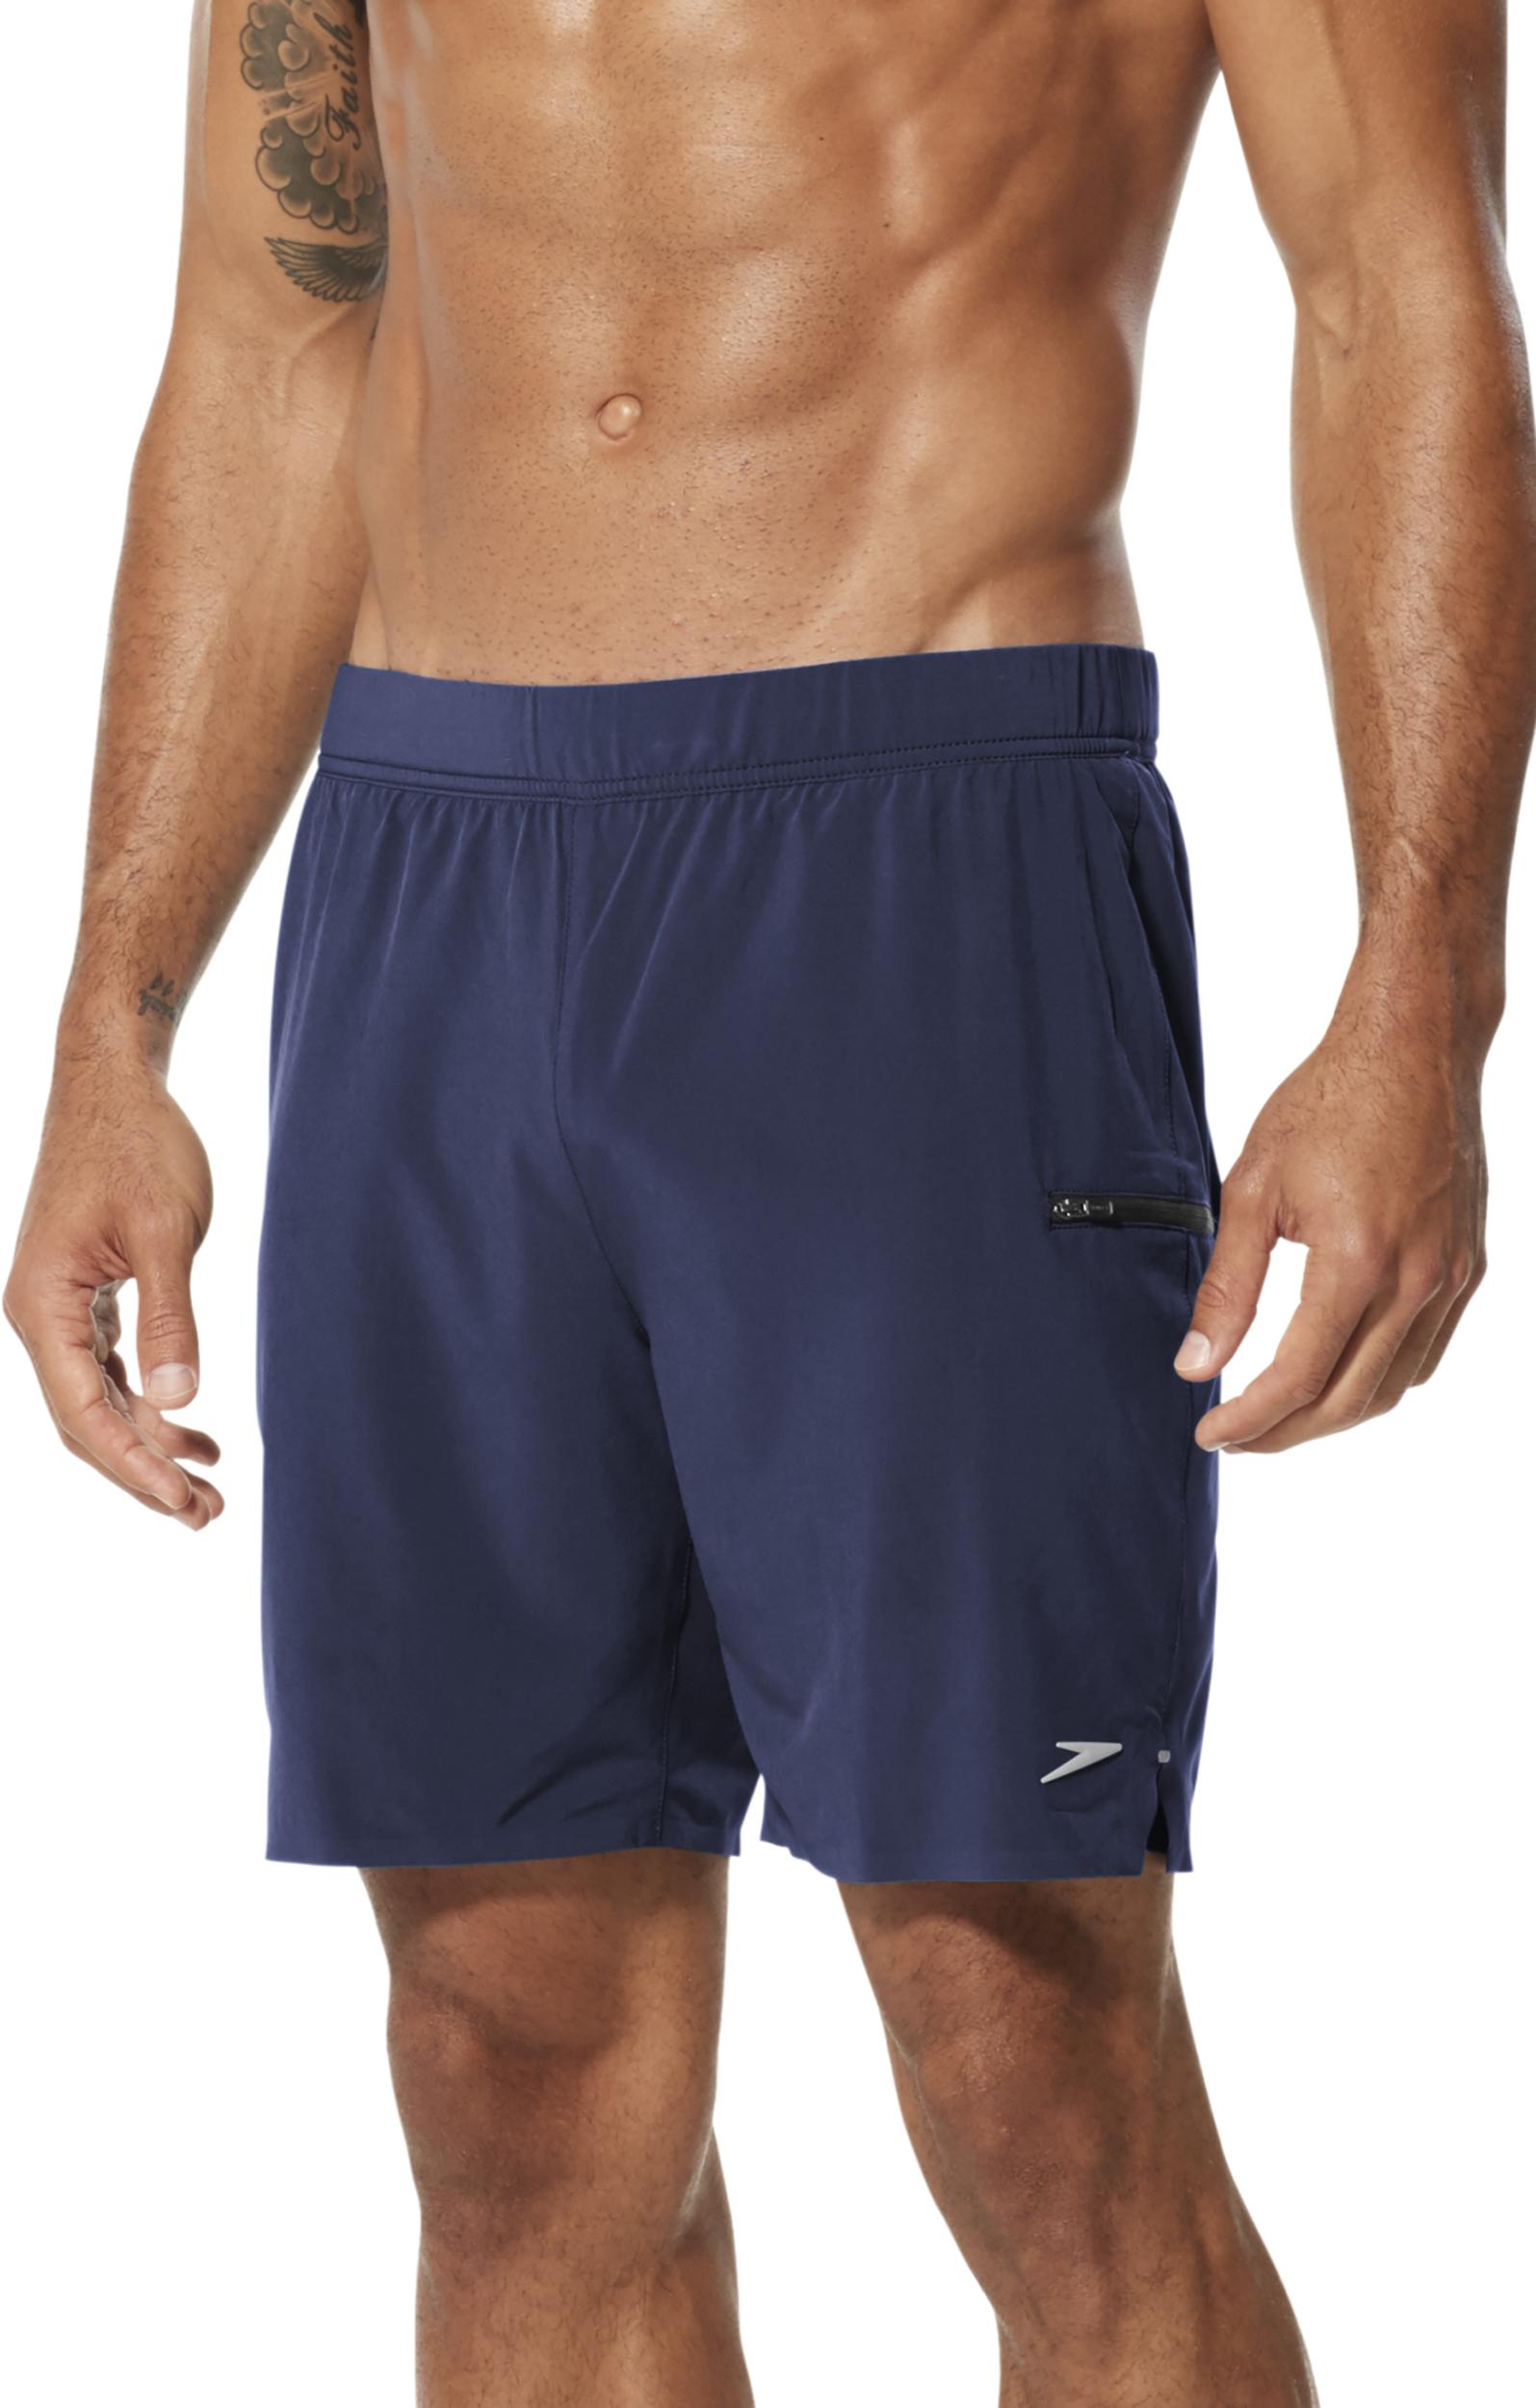 ce8415ea0e Speedo Active Flex Speed Shorts - Men's   MEC